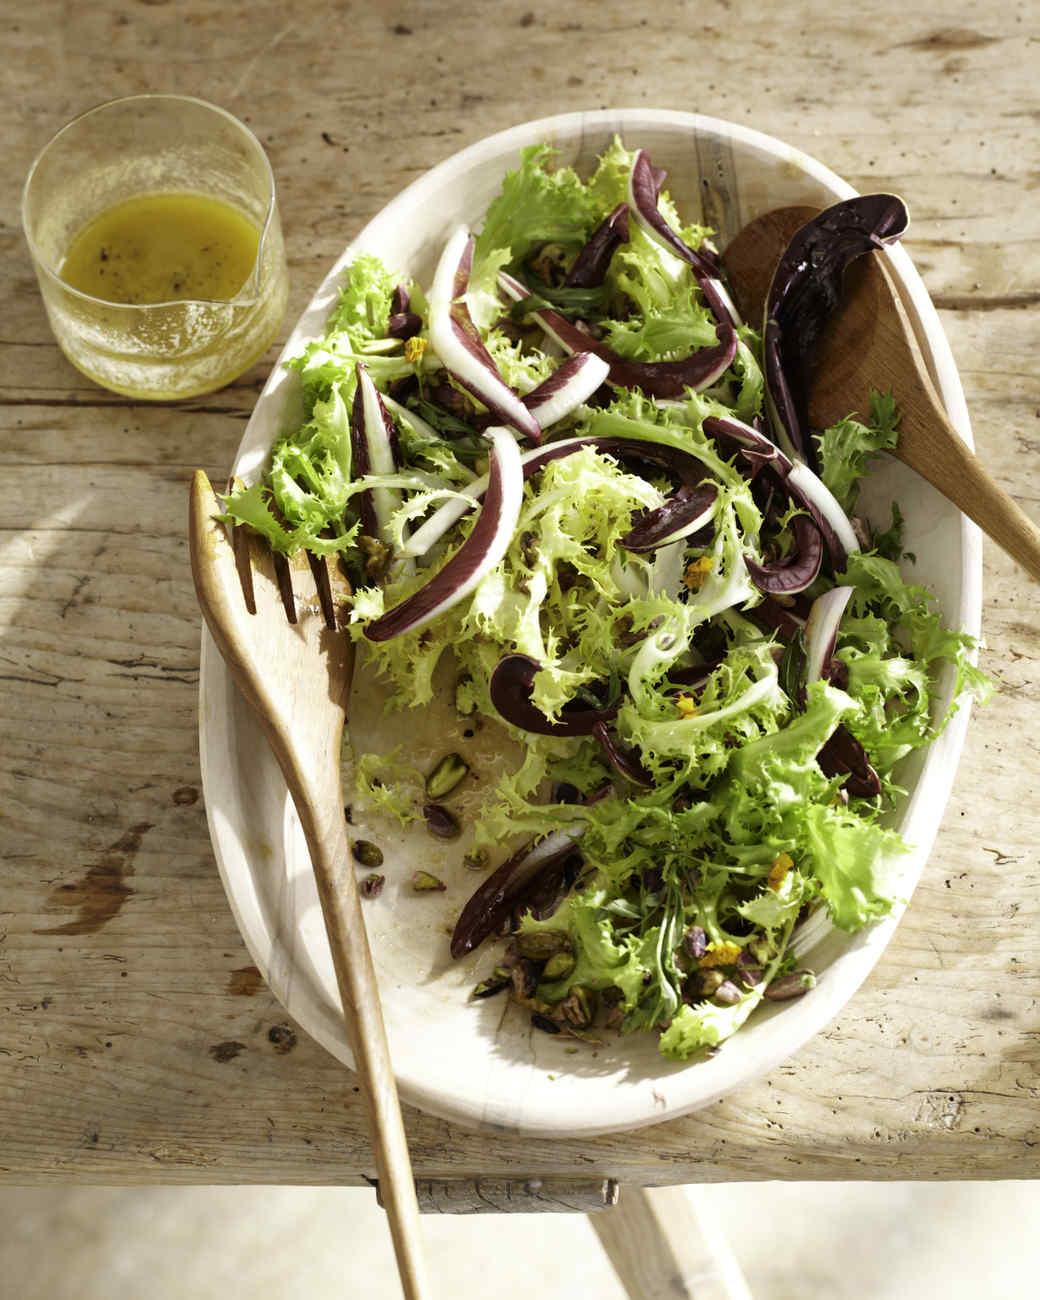 Frisee Salad with Pistachios and Dijon Vinaigrette